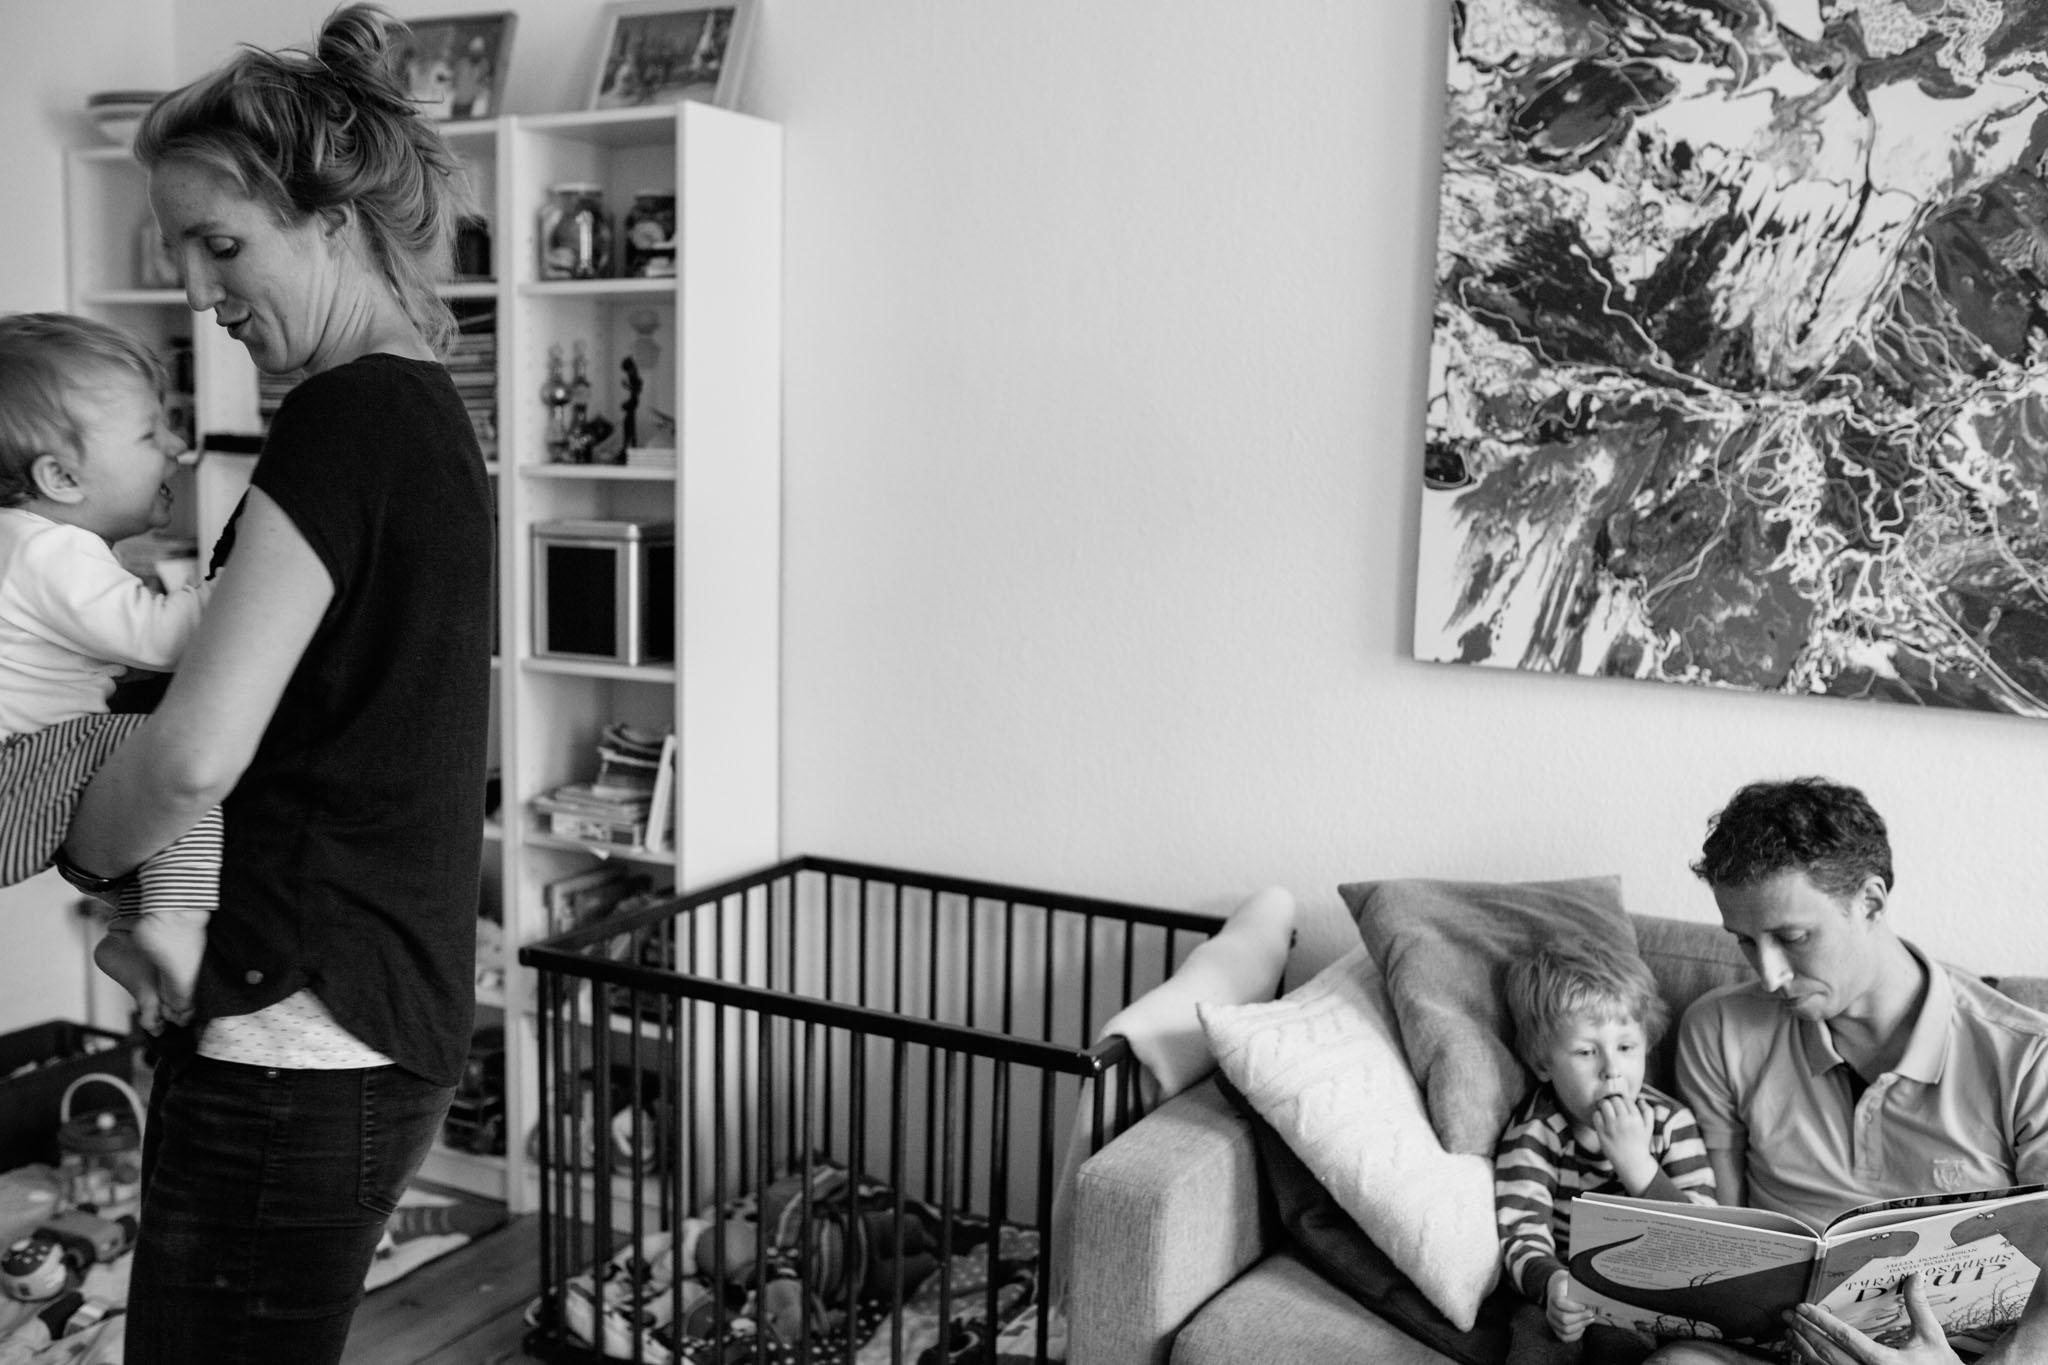 familienfotos-reportage-schwarzweiss-familie-fotograf-berlin